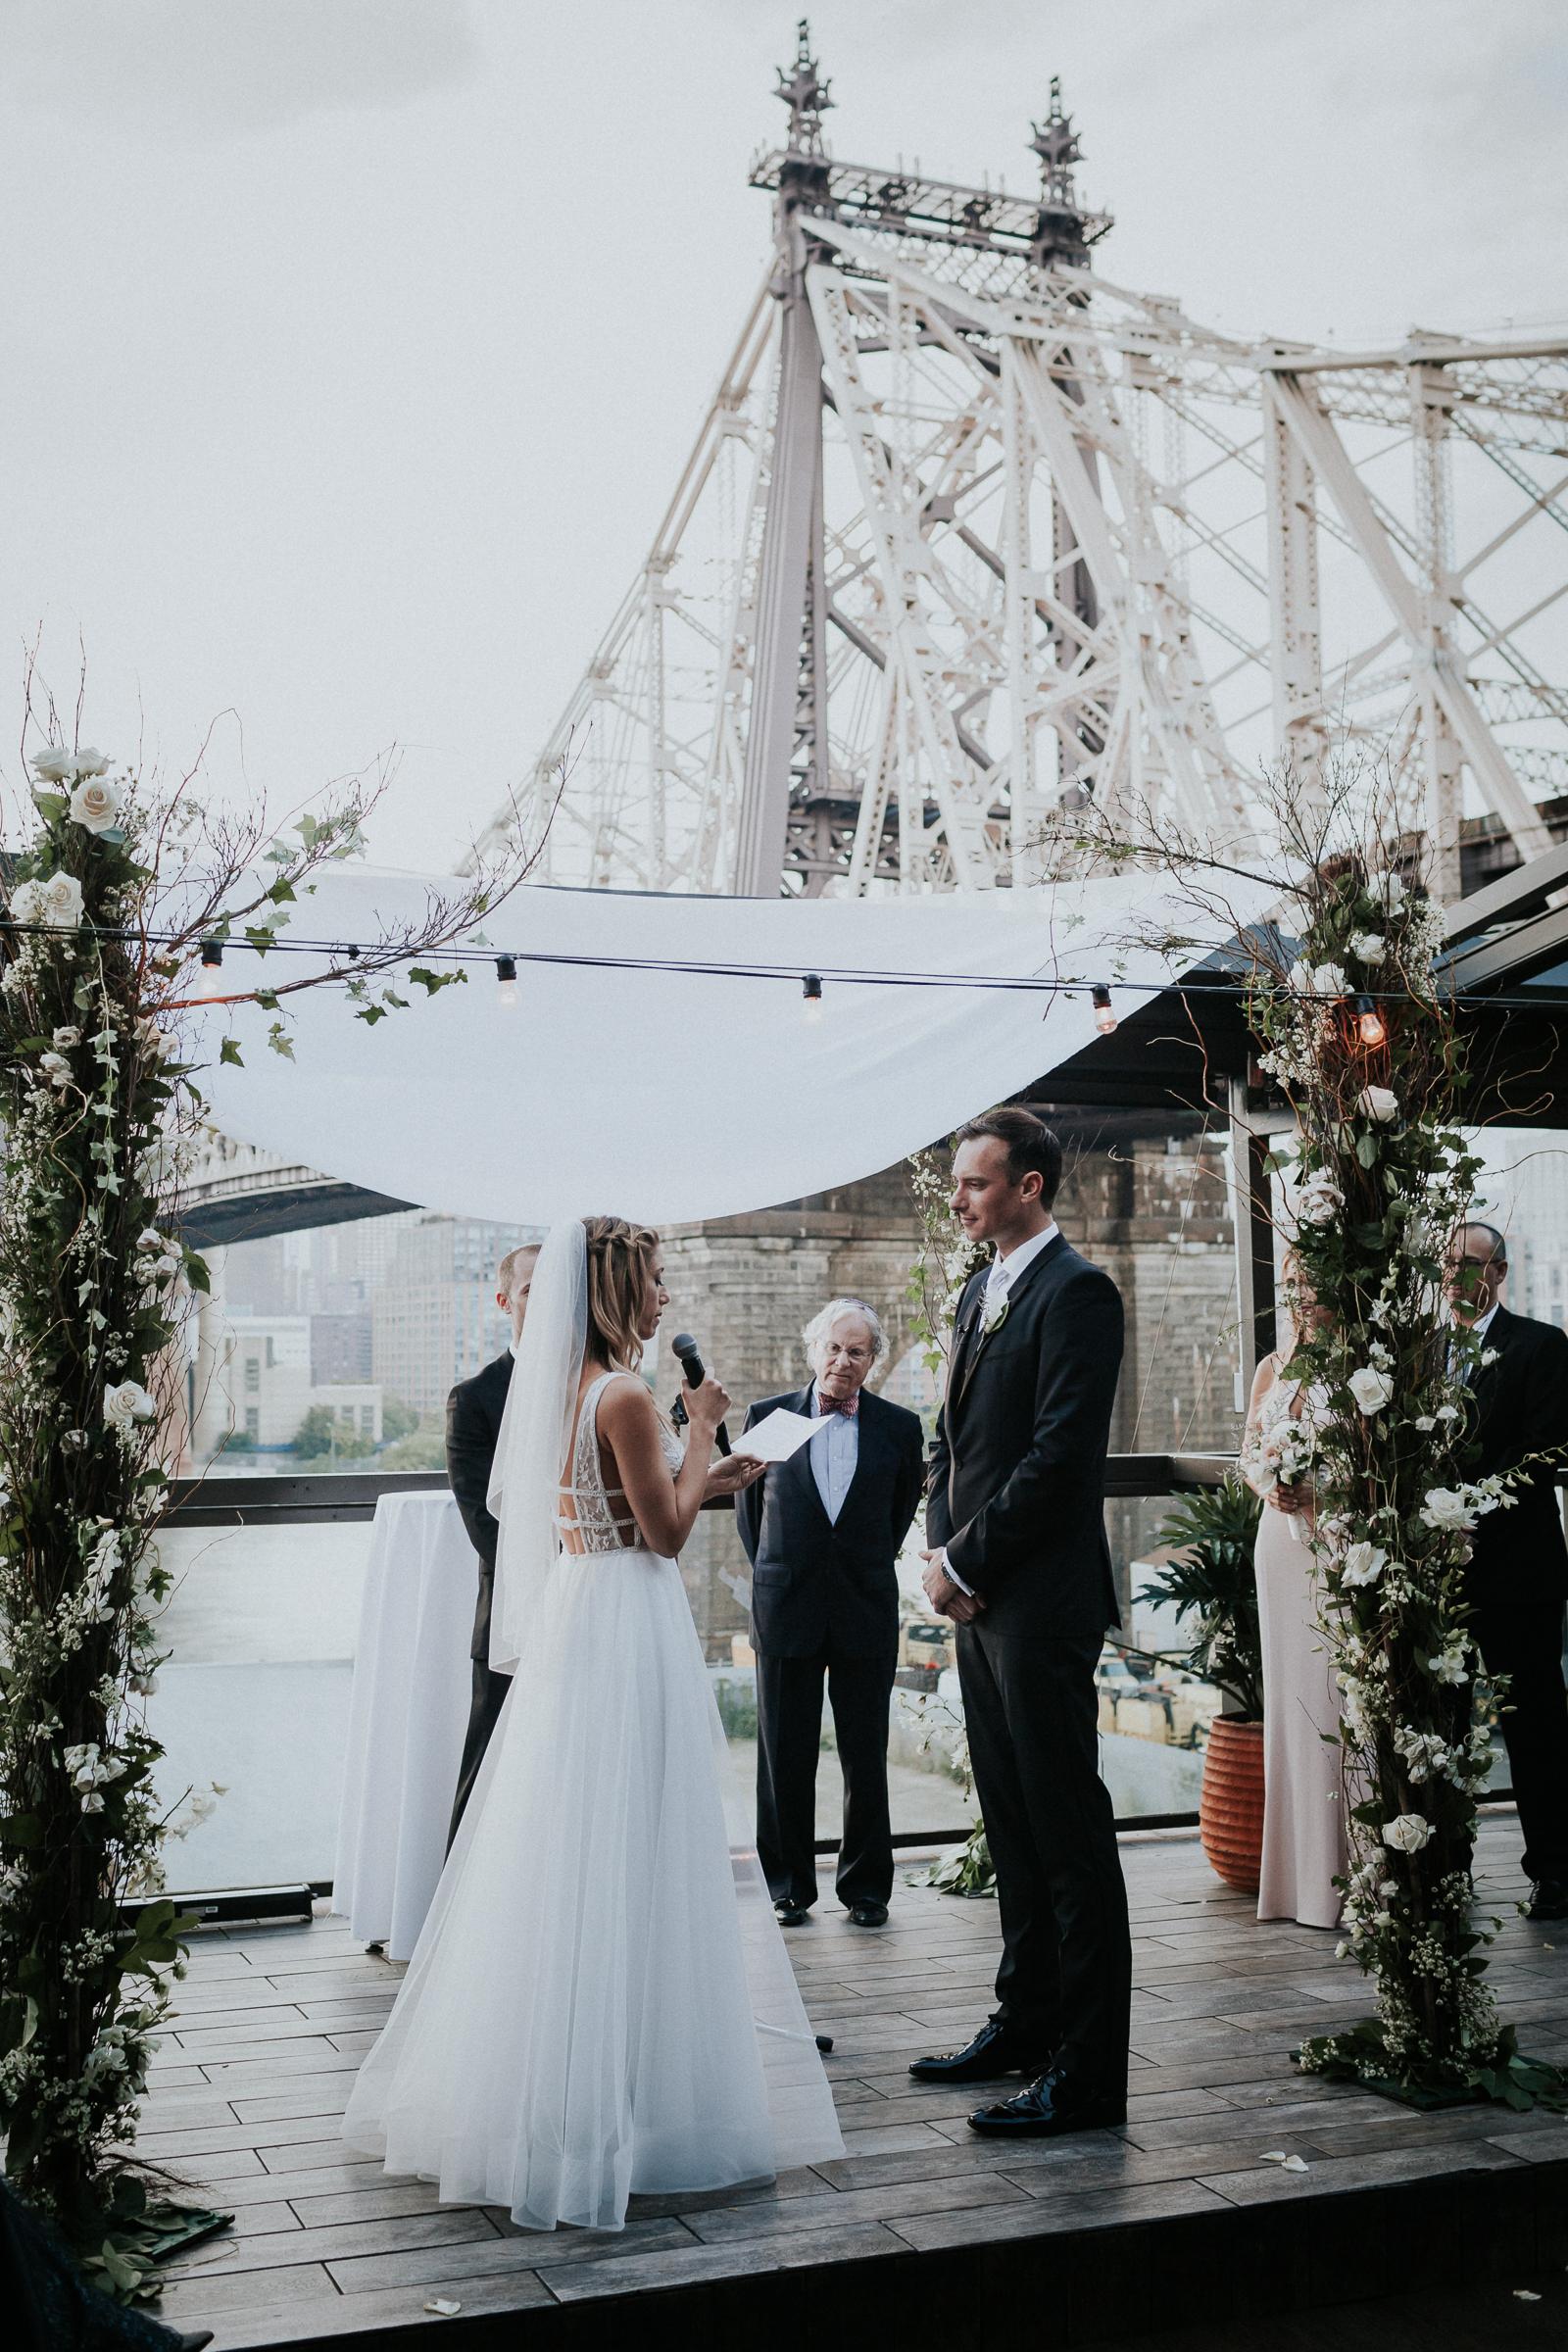 Ravel-Hotel-Penthouse-808-Long-Island-City-New-York-Documentary-Wedding-Photographer-72.jpg